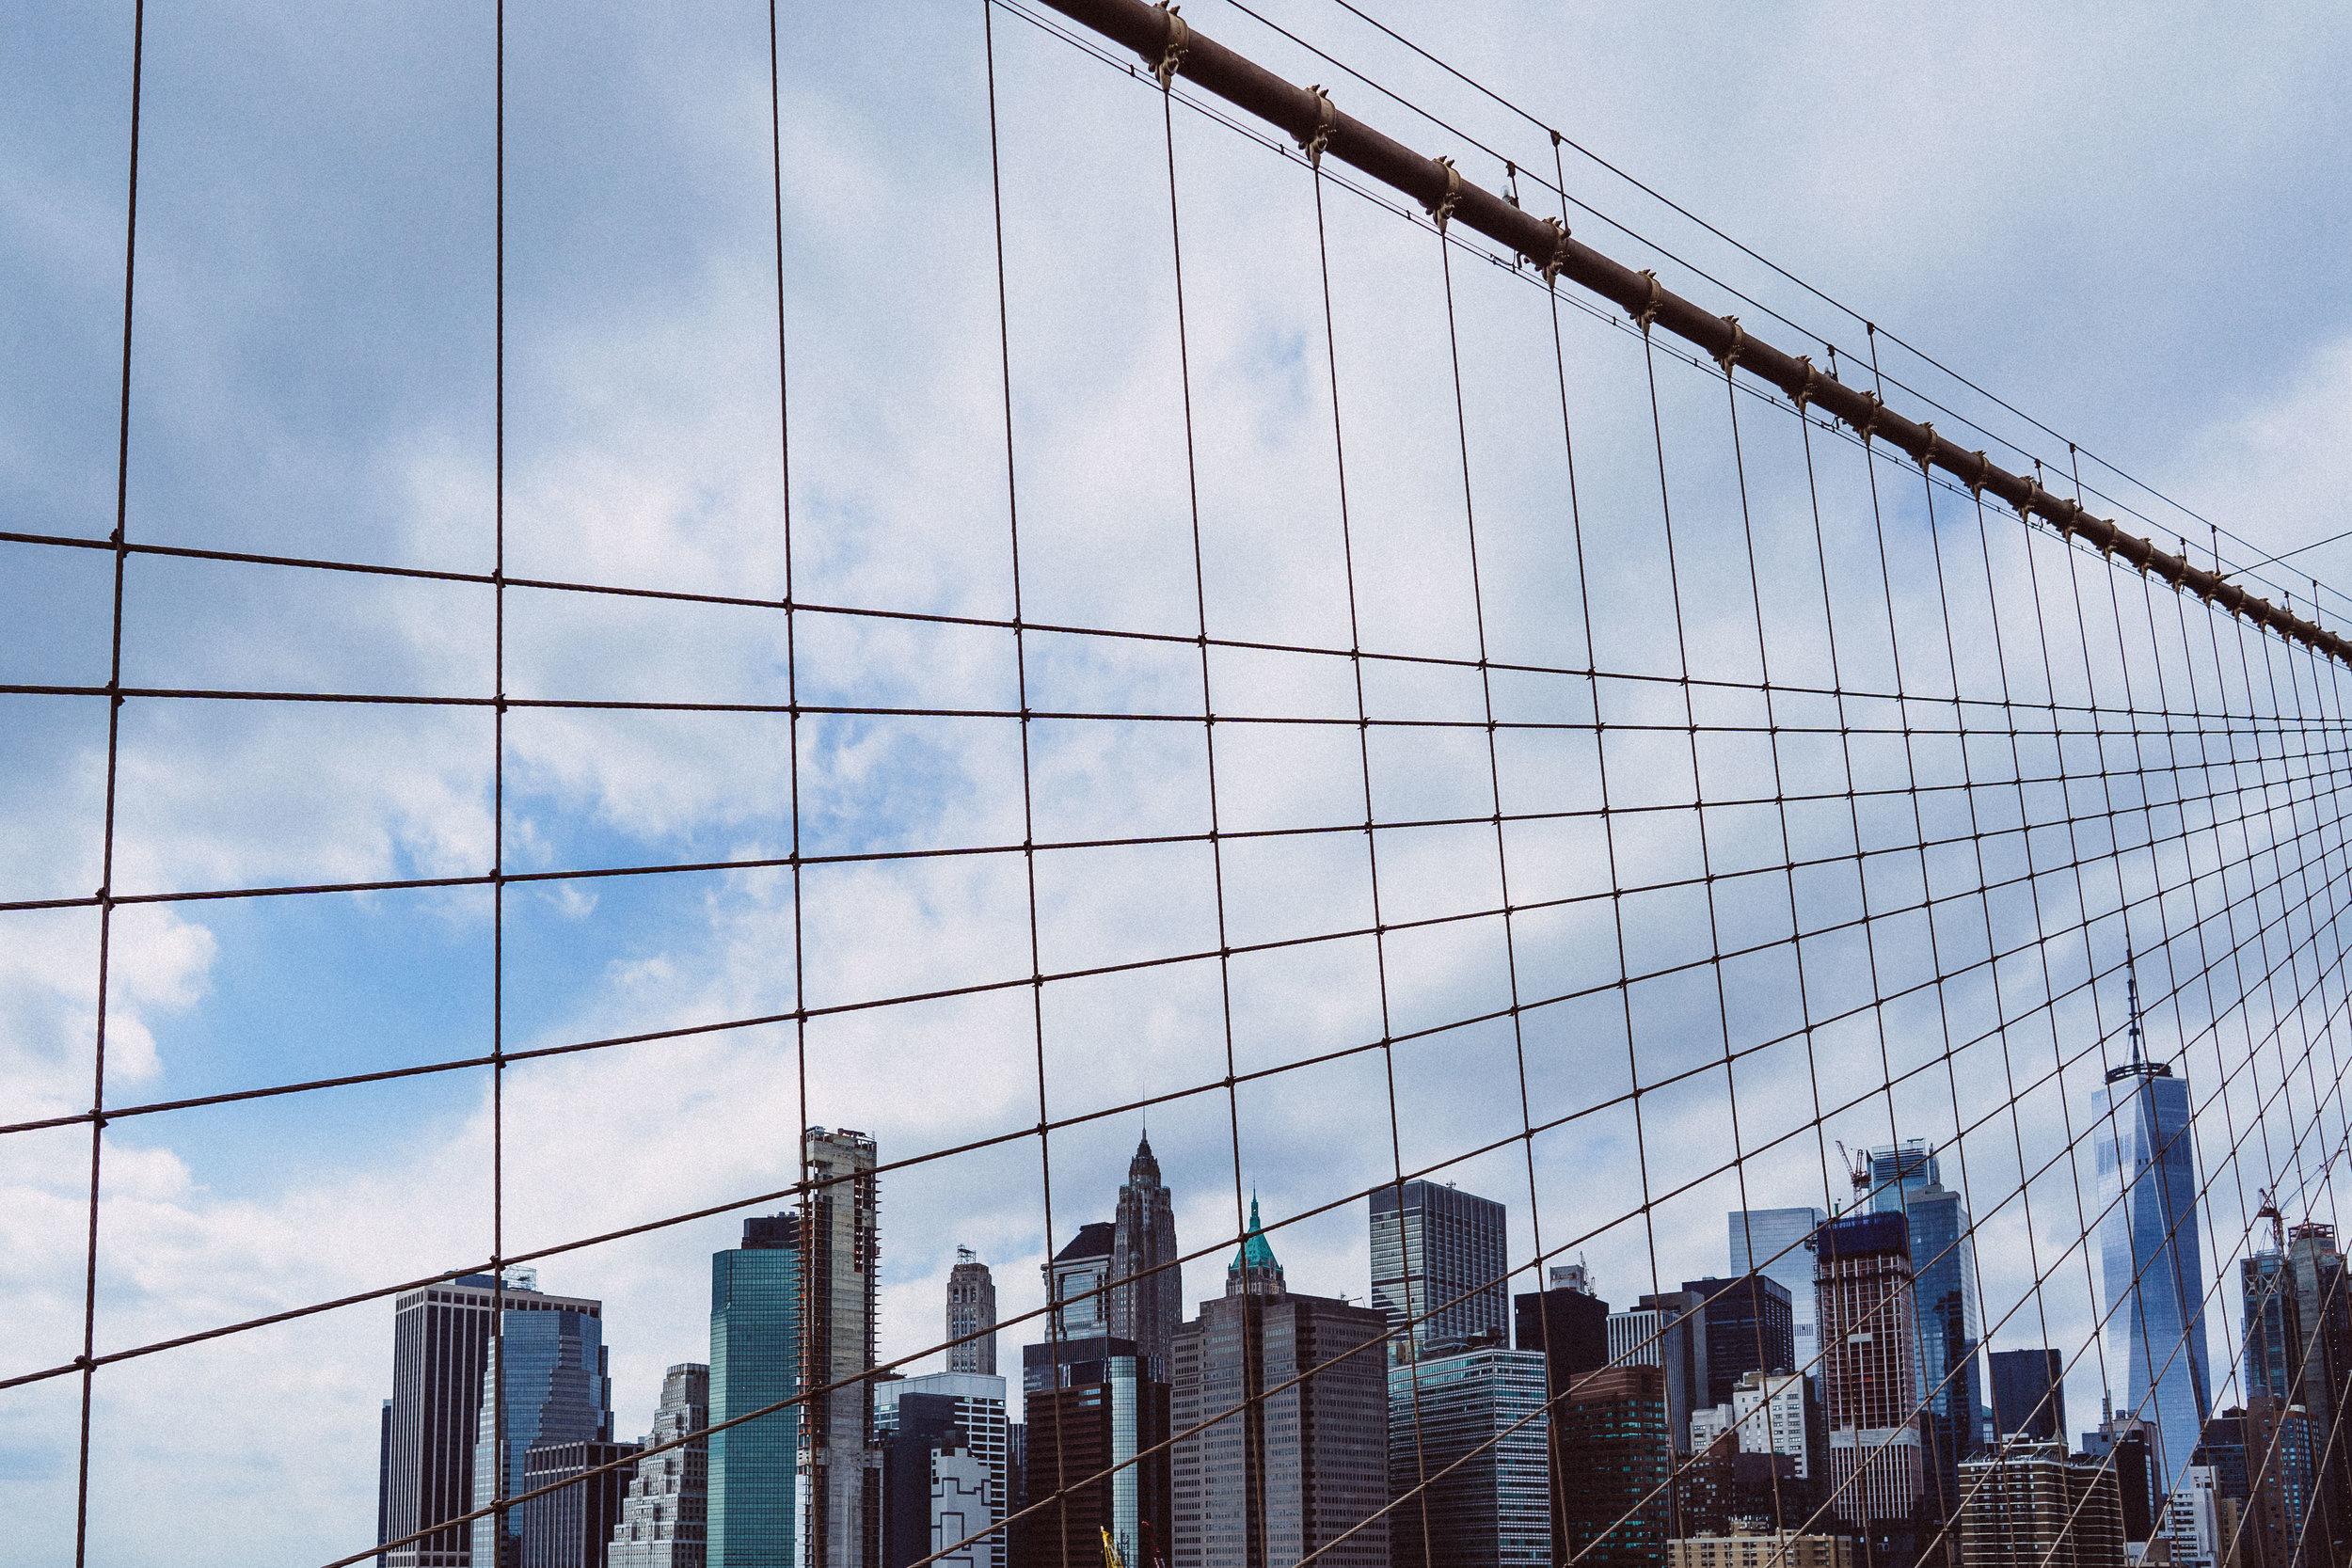 newyork-sony-102272.jpg